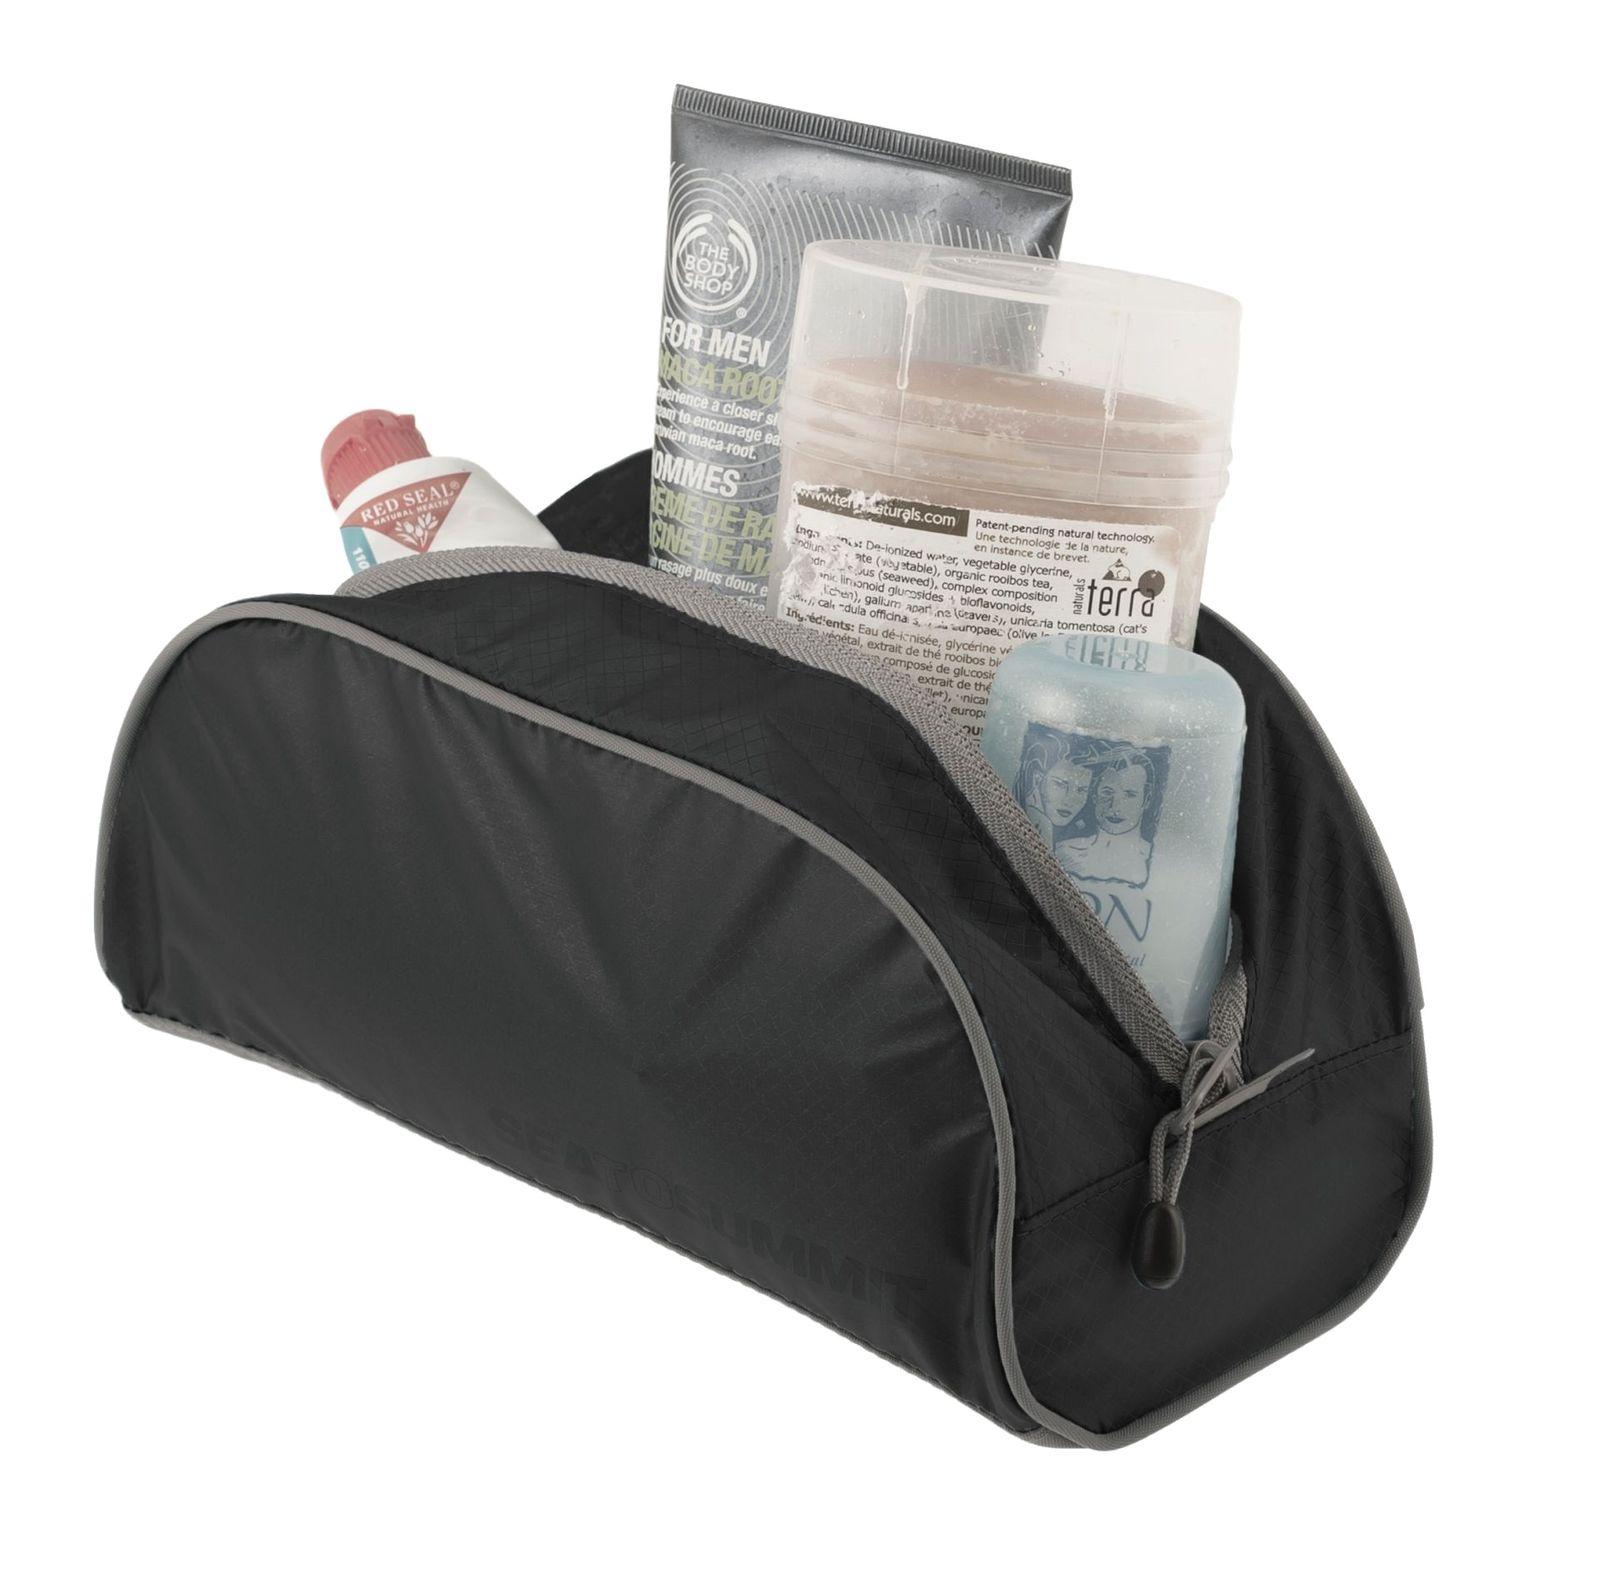 Sea To Summit Toiletry Bag TravellingLight Small Black   Grey ea449a11e7f87